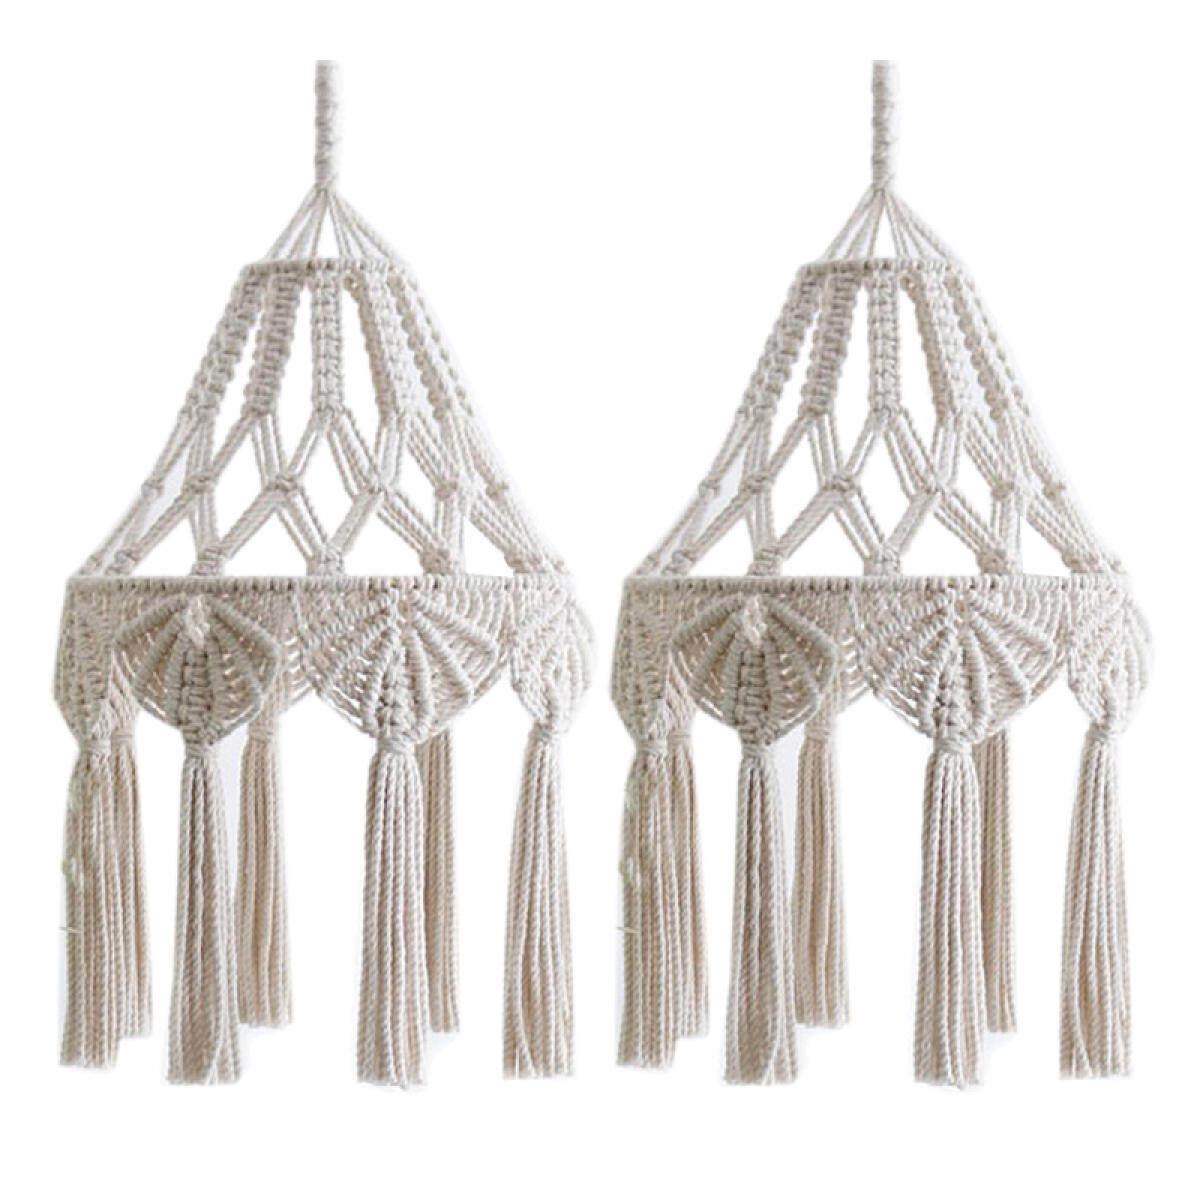 2 Pack Weave Macrame Lamp Shades Tassel Pendant Light Cover Office Bedroom Living Room Dorm Bohemian Home Decor Lazada